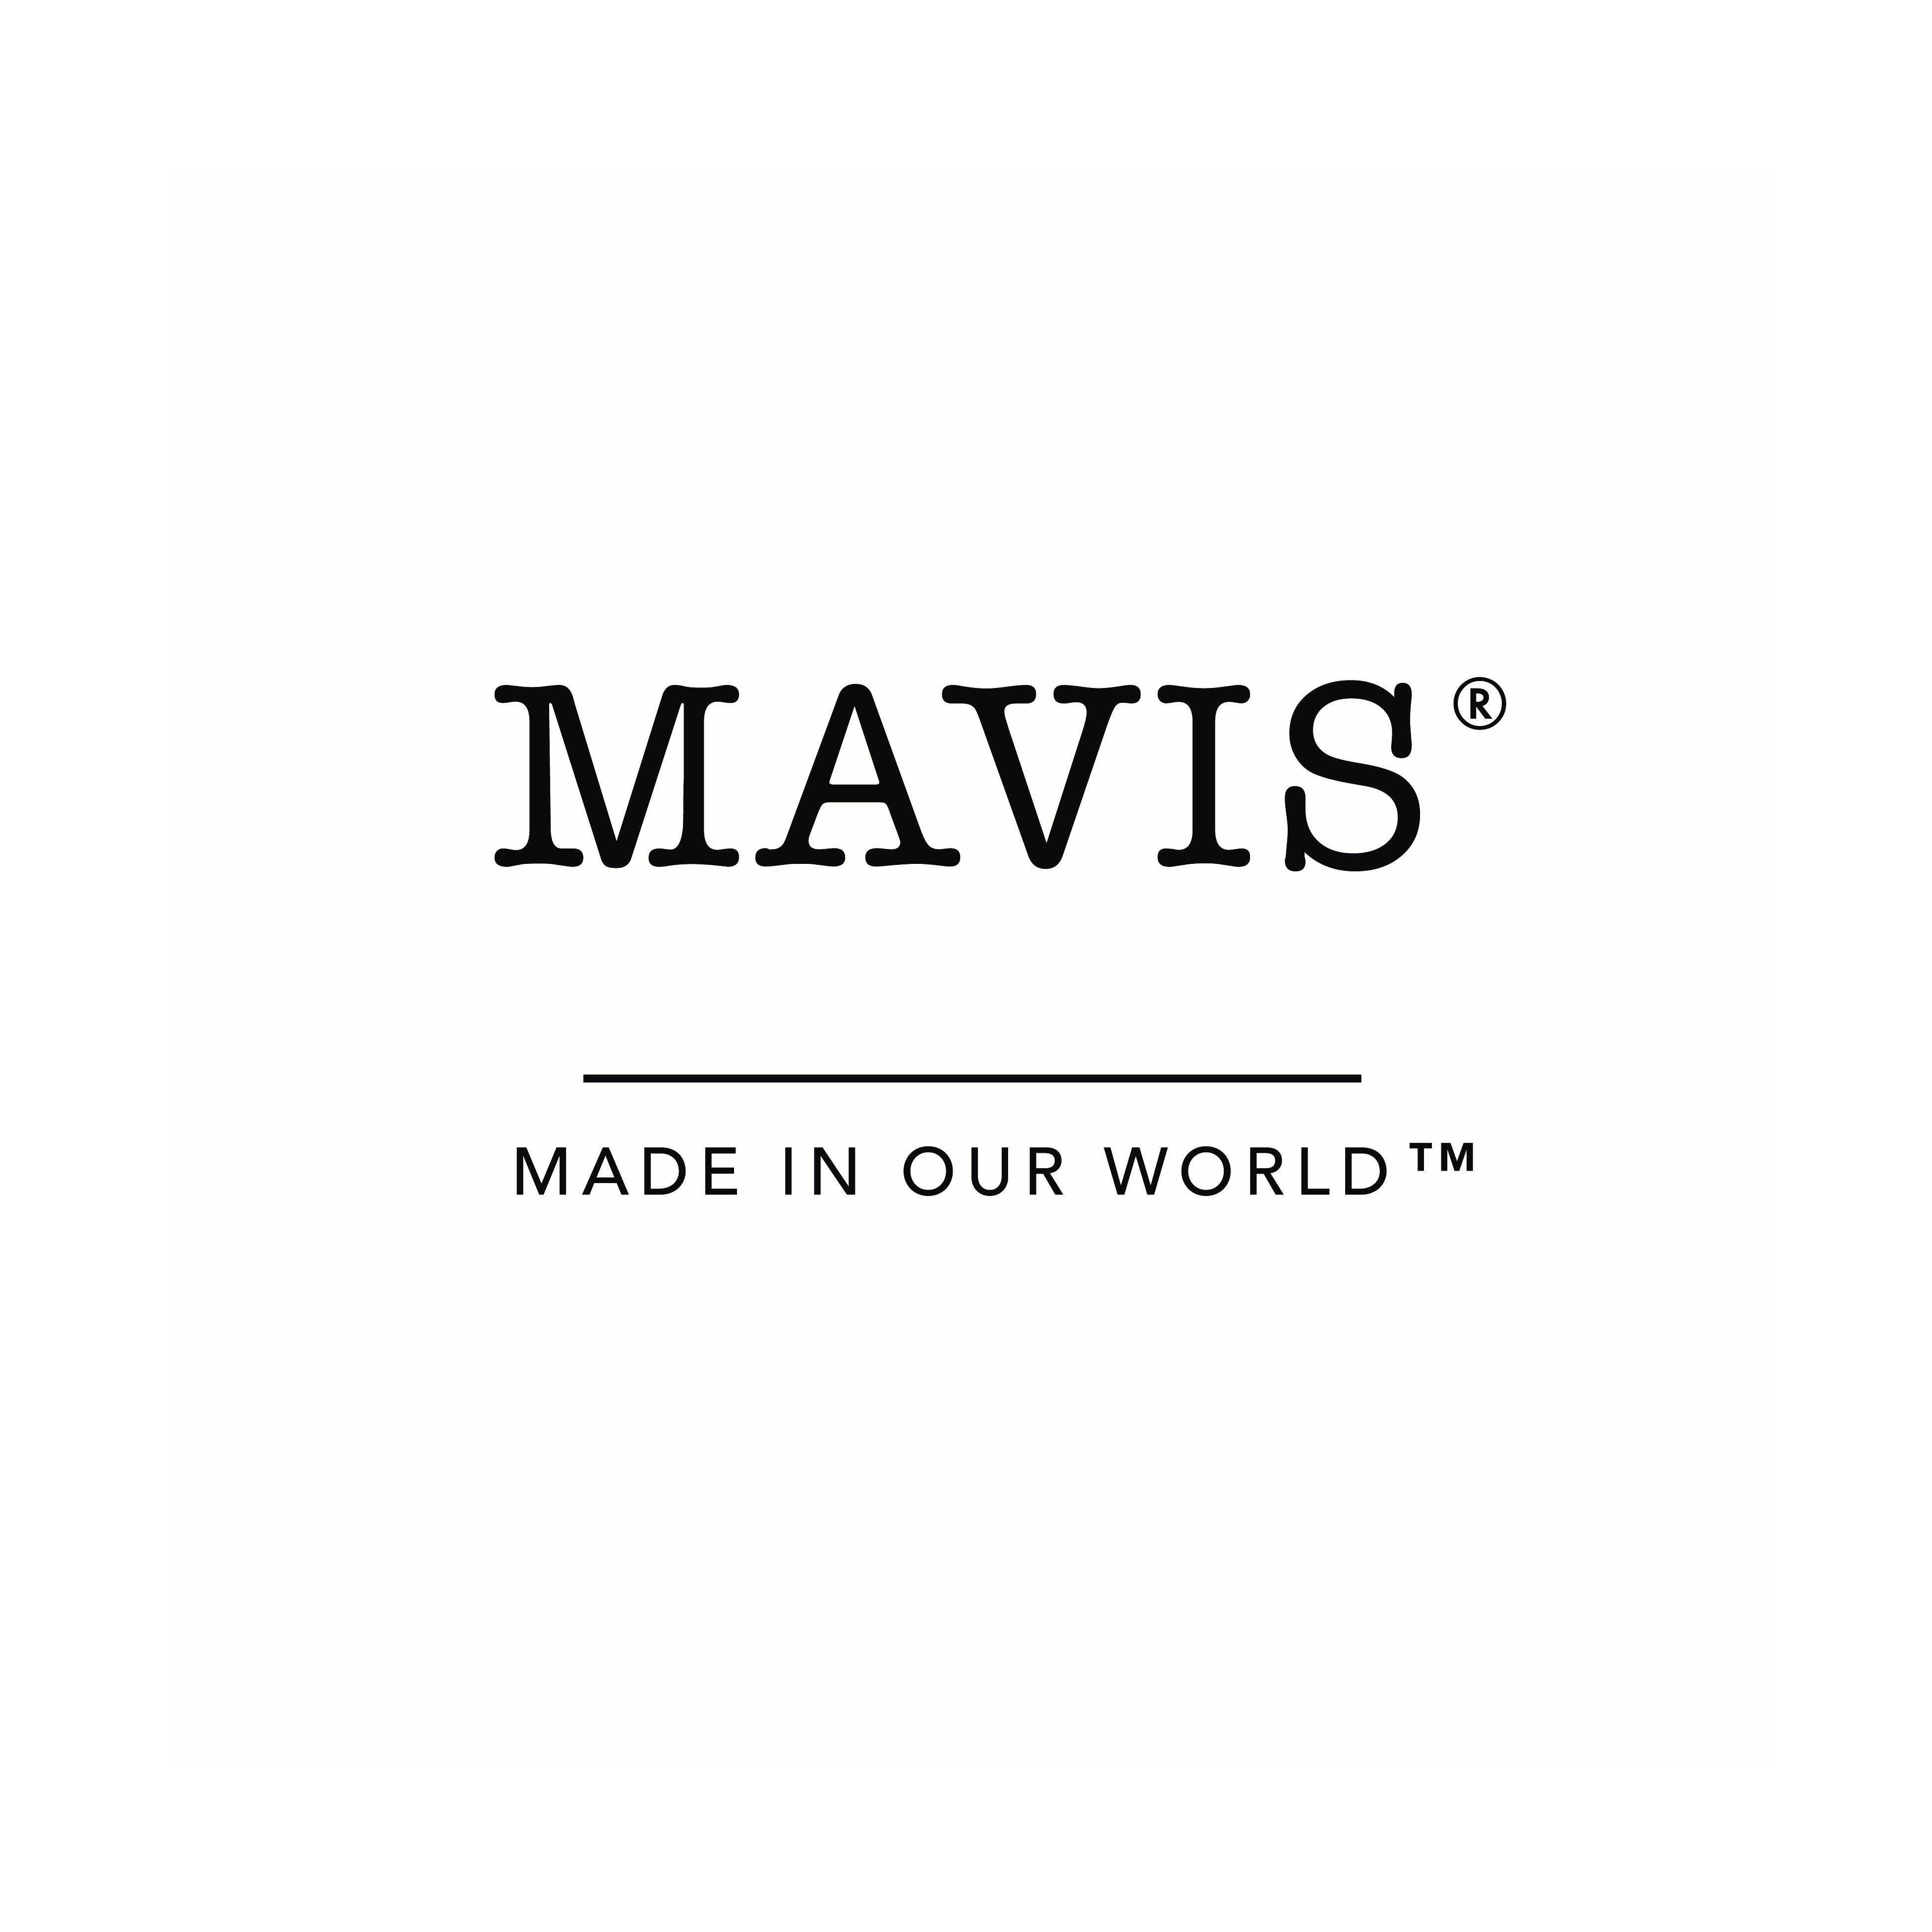 logotyp Mavis